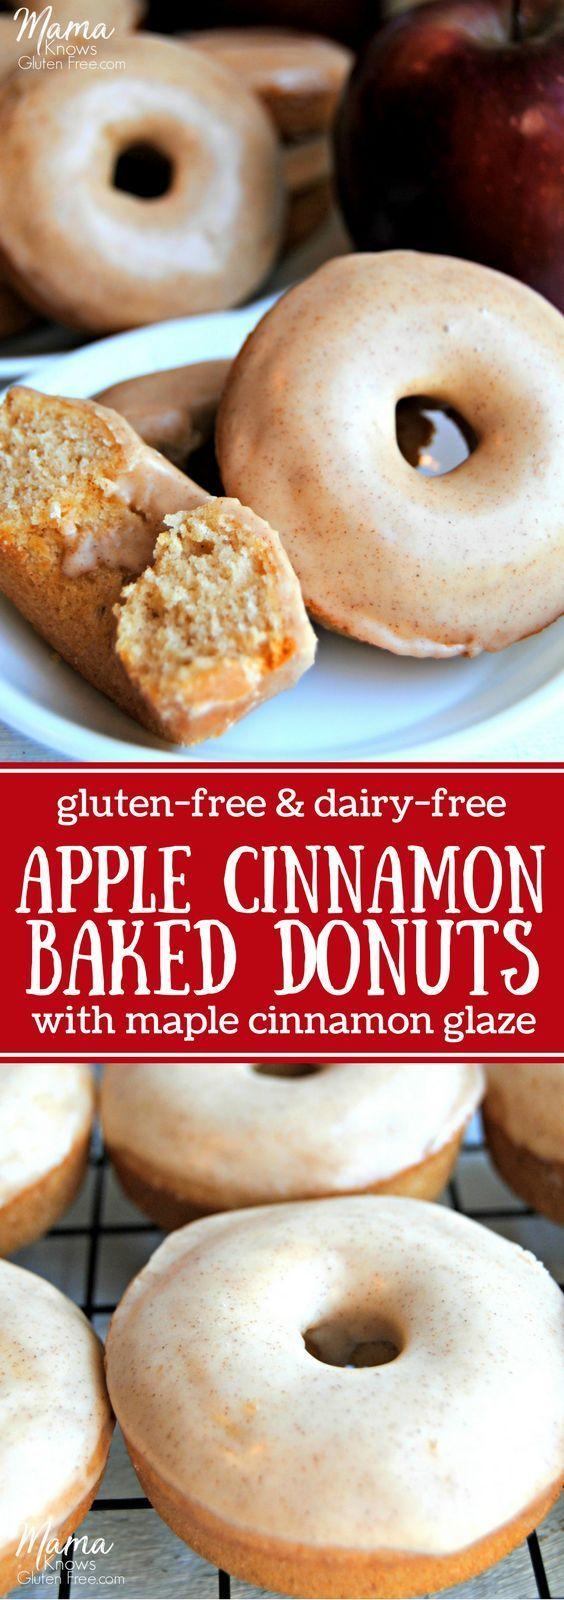 Baked Apple Cinnamon Donuts {Gluten-Free, Dairy-Free}